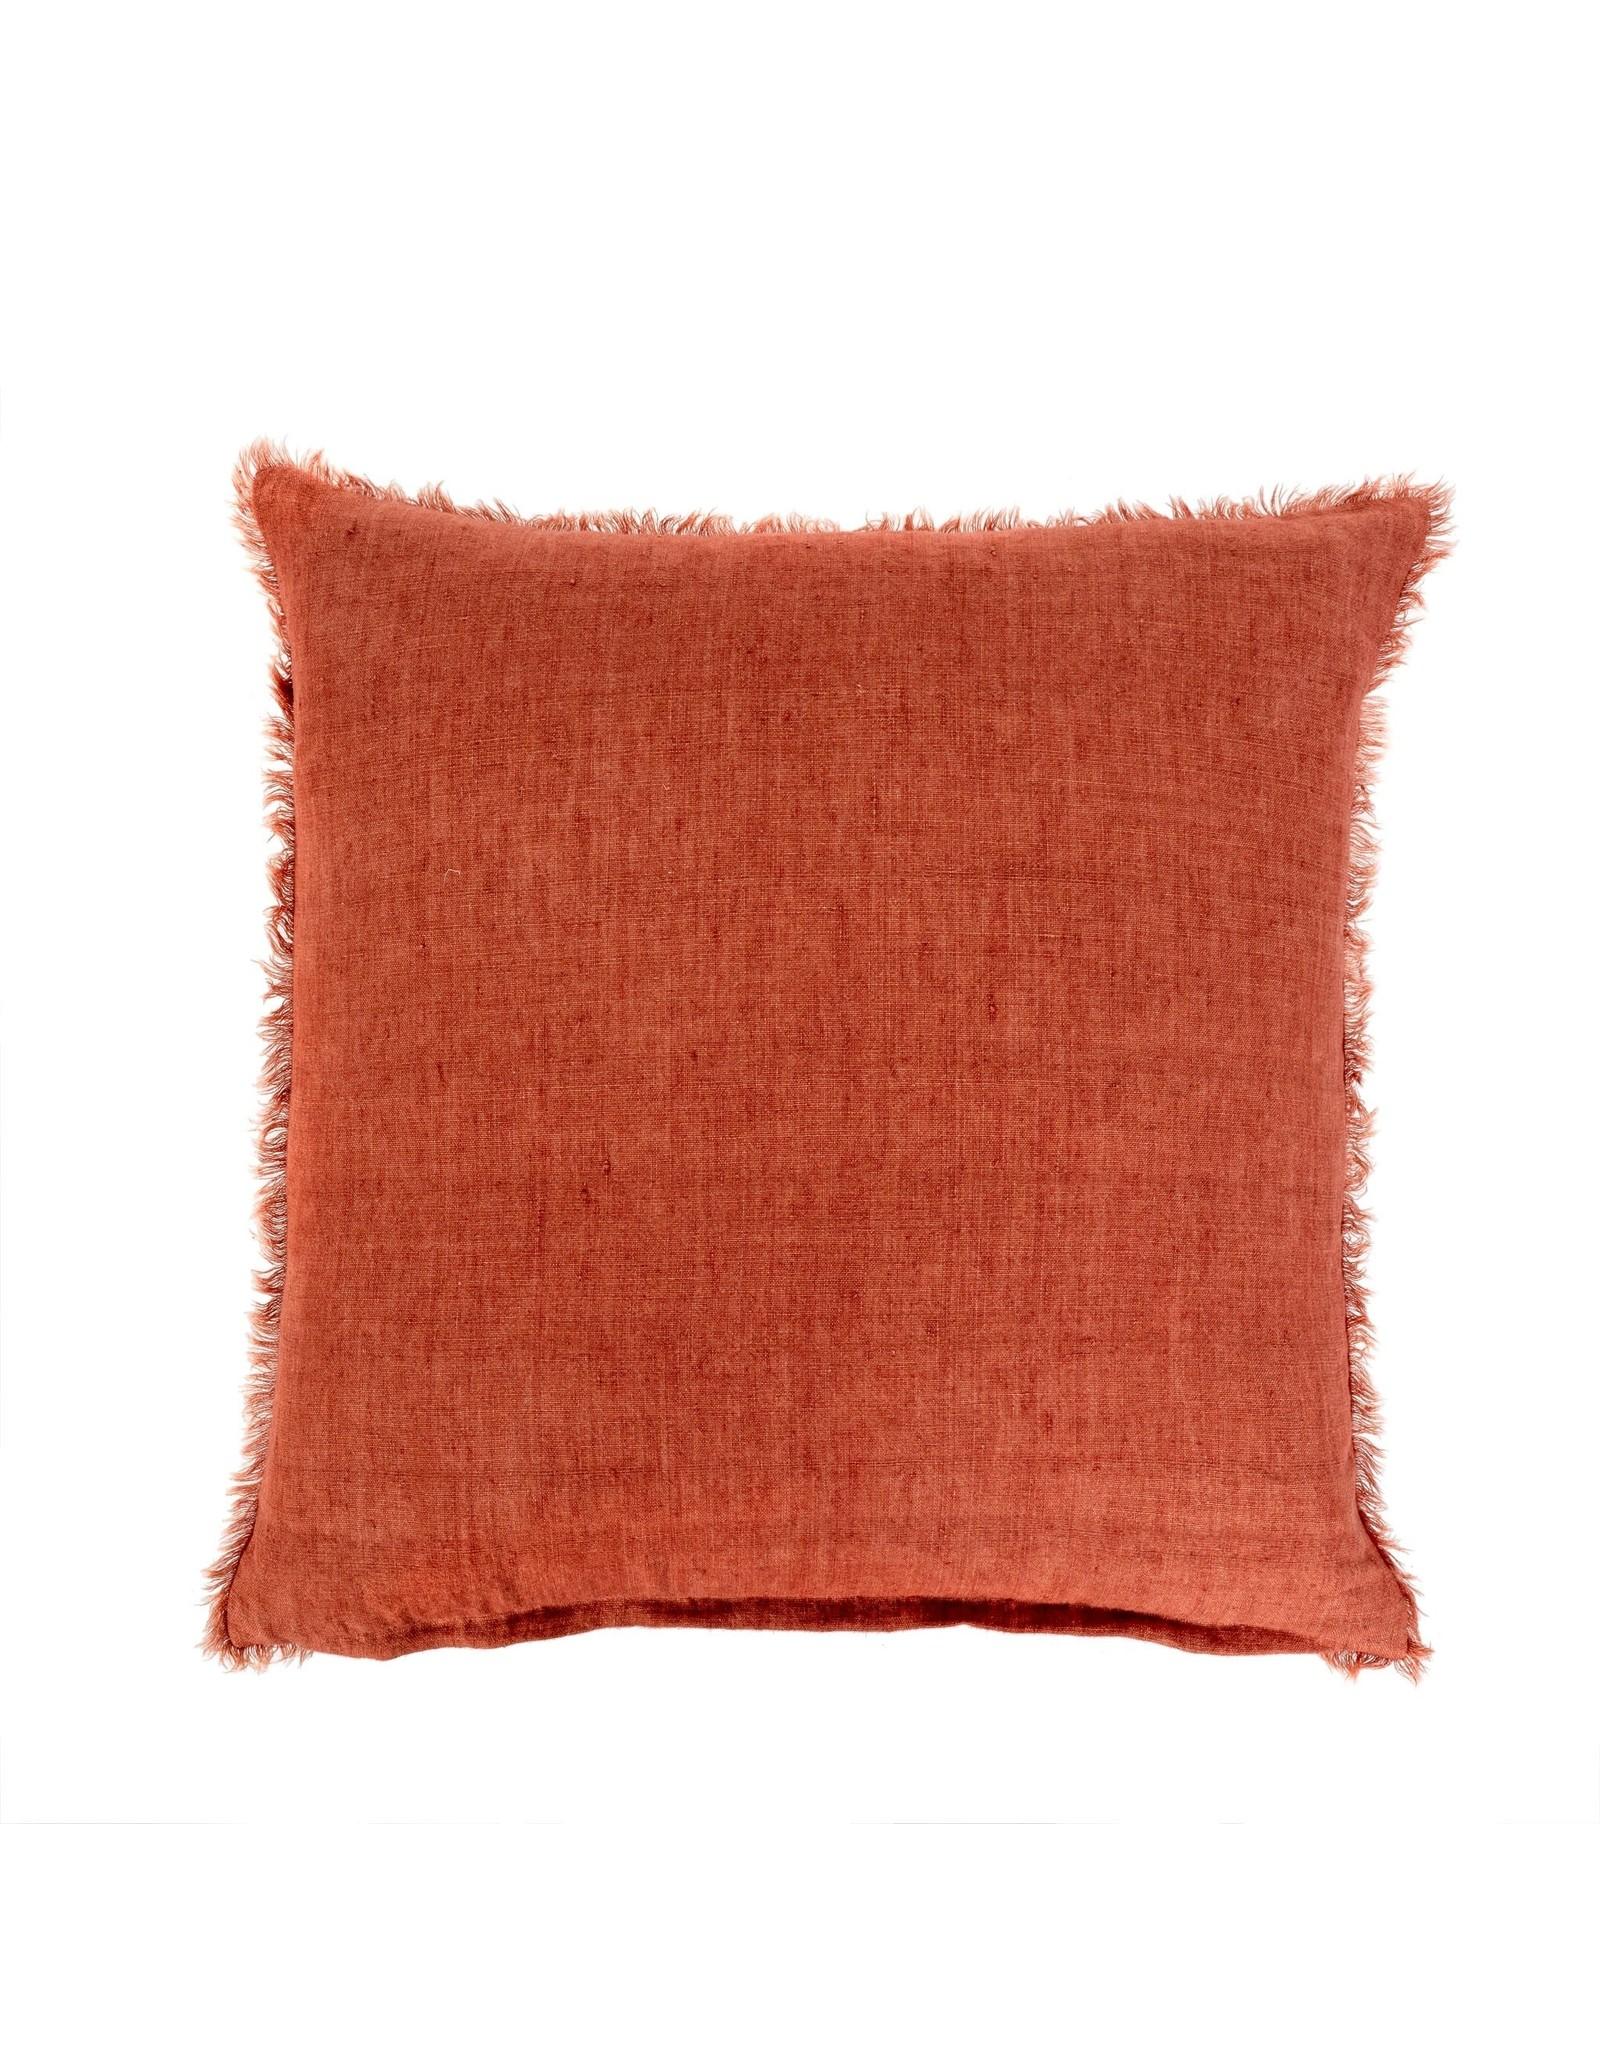 Lina Linen Cushion Rust 24x24